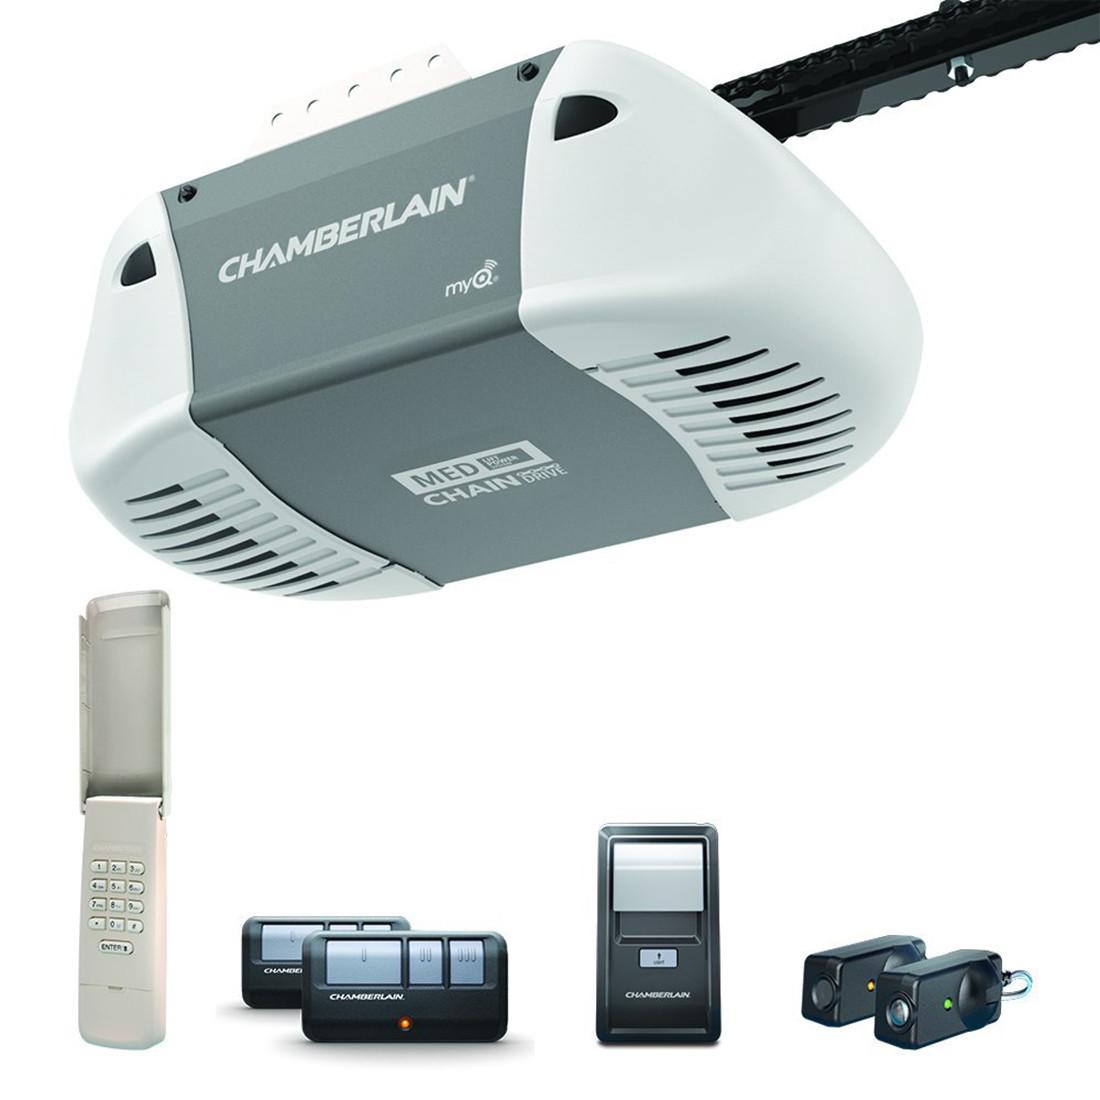 1-Chamberlain-C410-Durable-Chain-Drive-Garage-Door-Opener.jpg